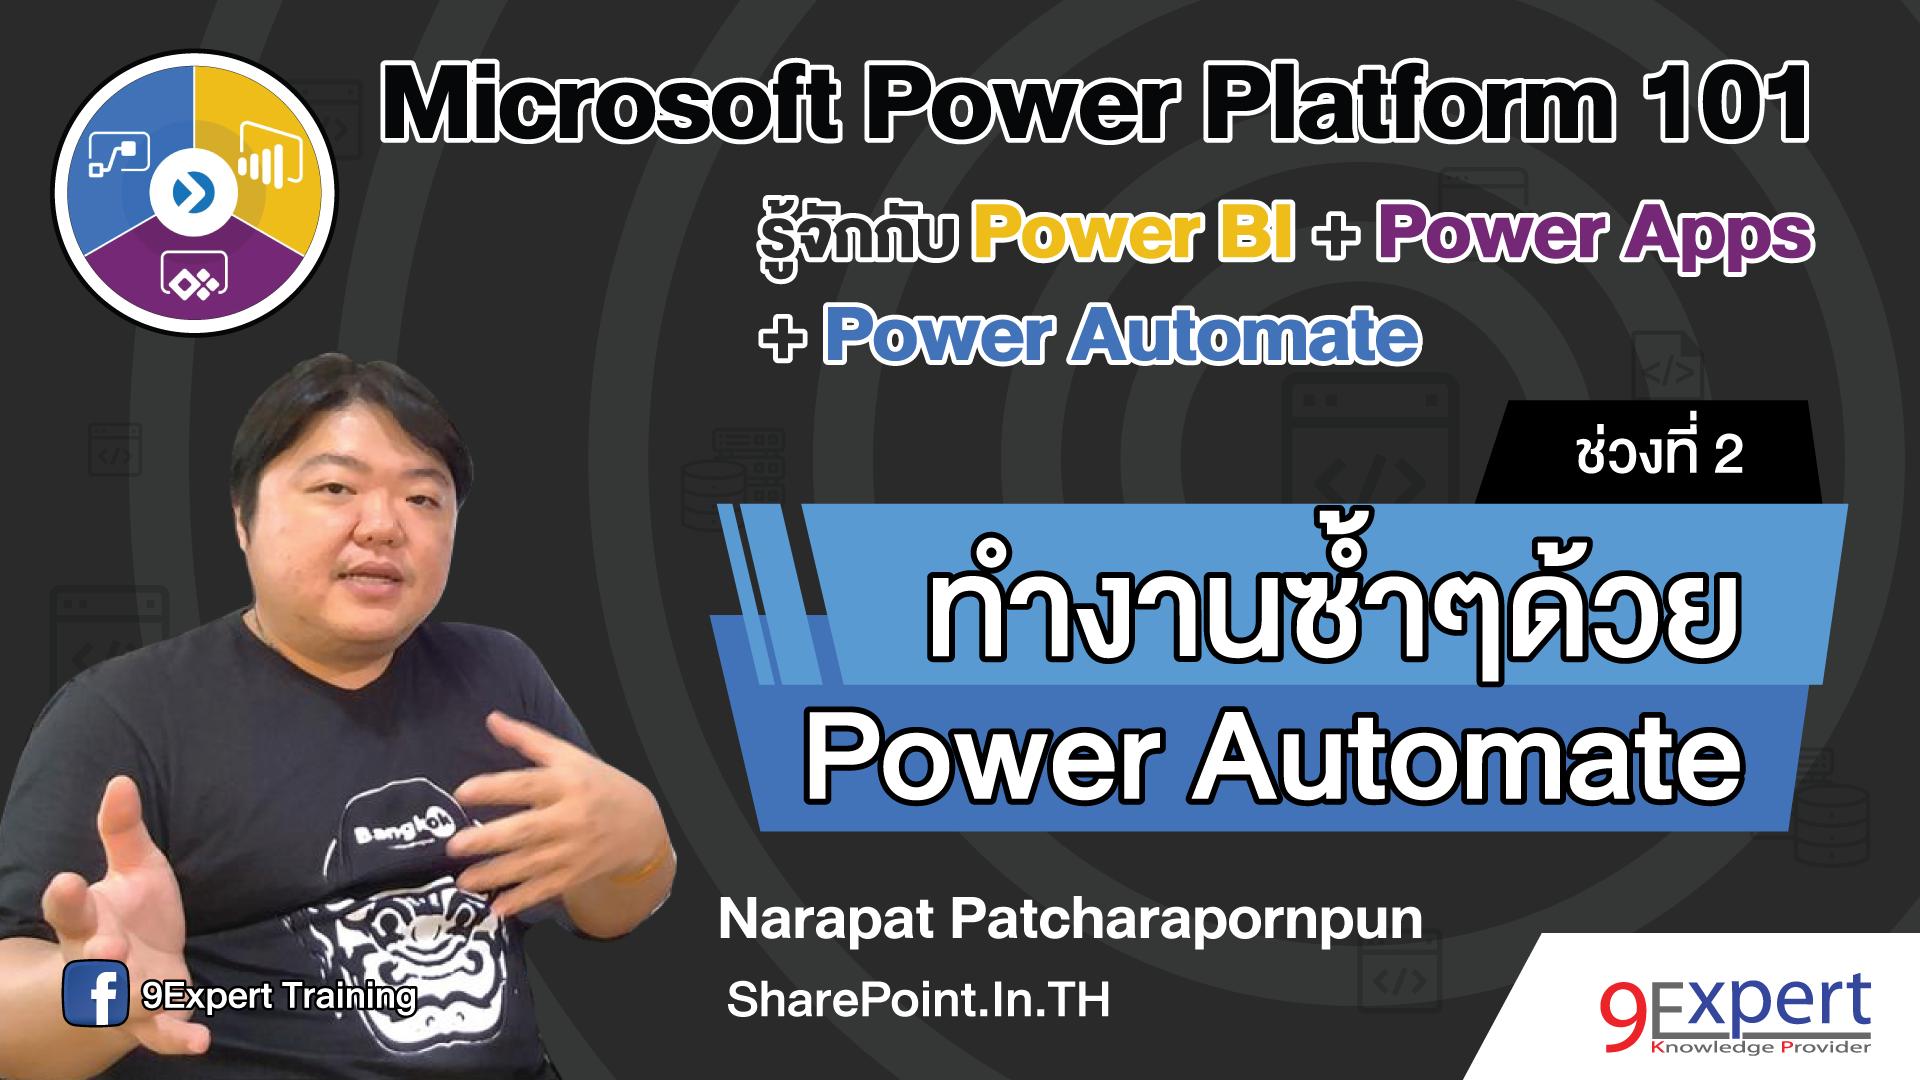 Microsoft Power Automate เป็นเครื่องมือในการทำงานแบบ Automation